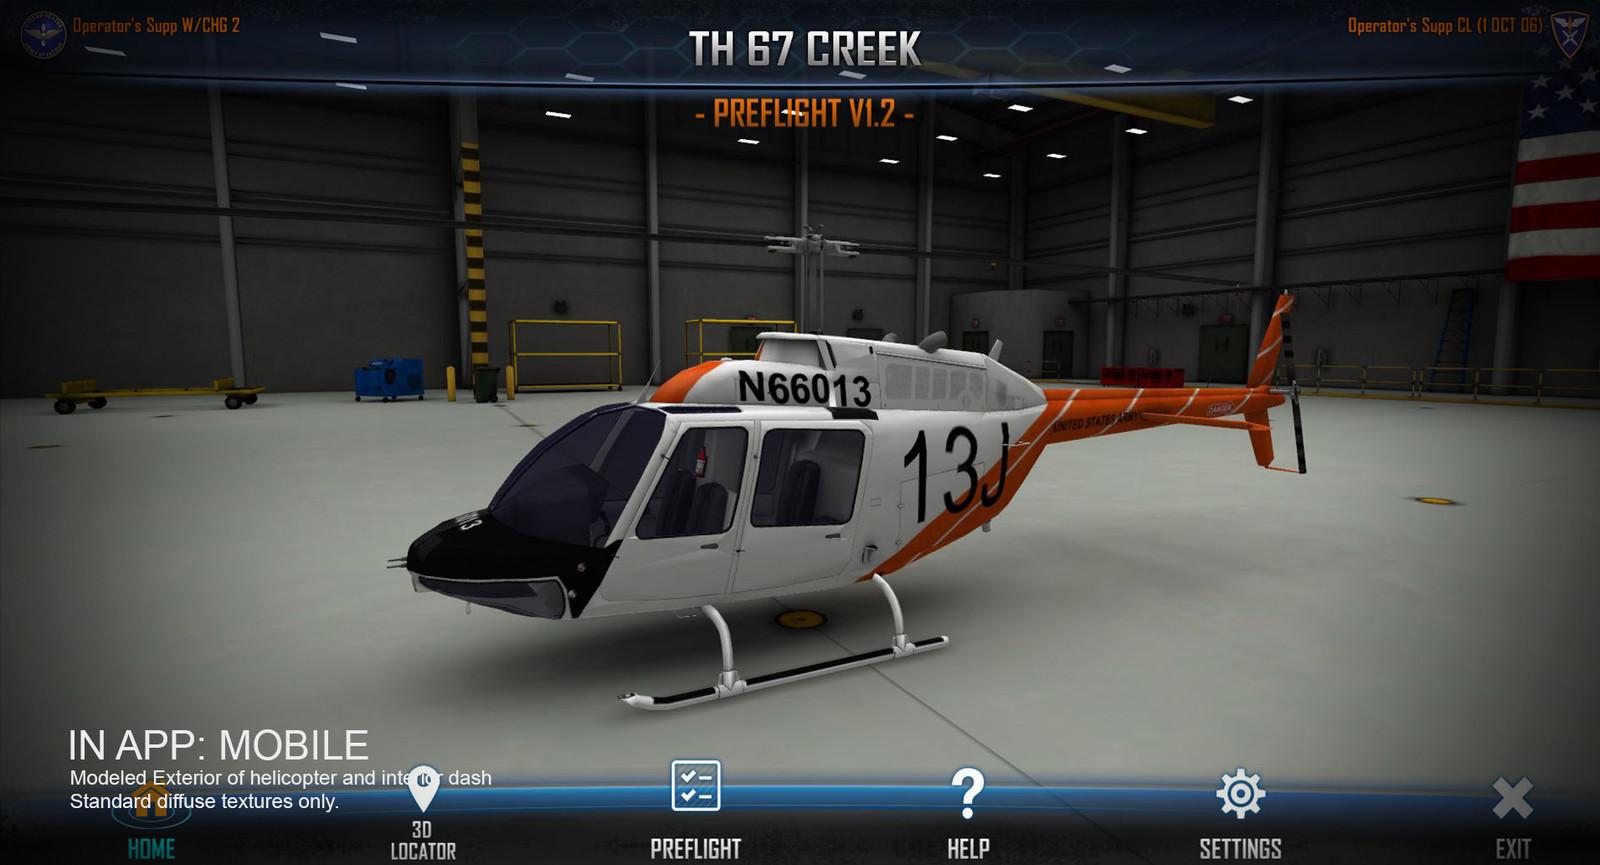 TH-67